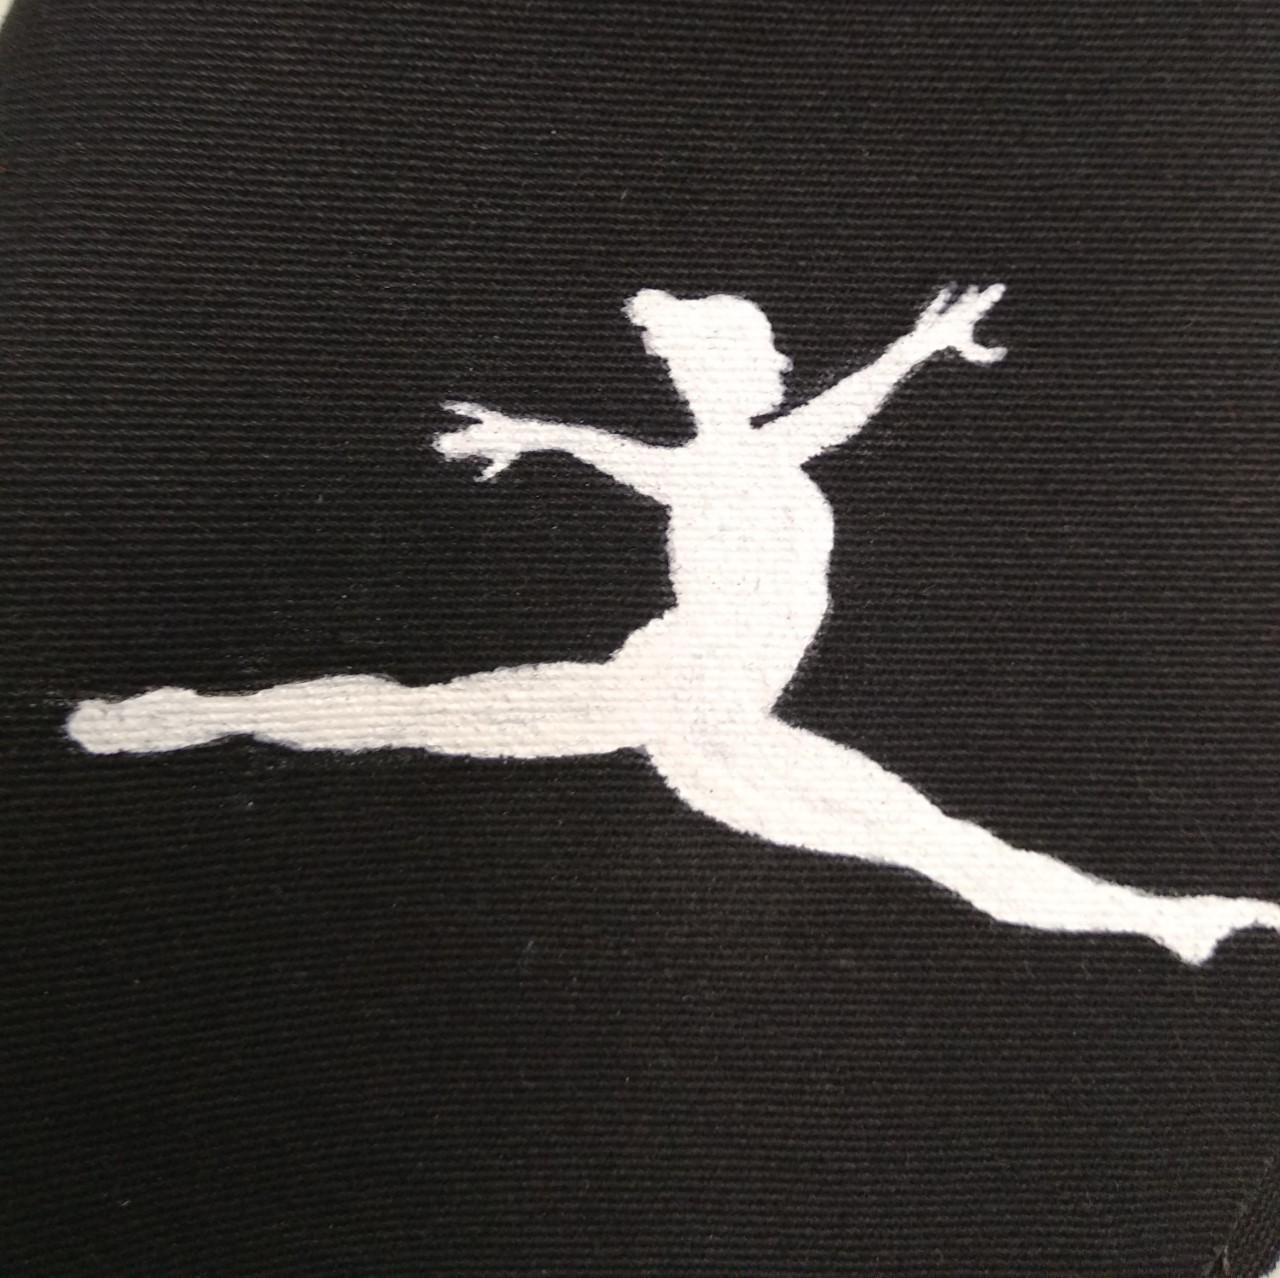 bailarina - copia (2) - copia.jpg